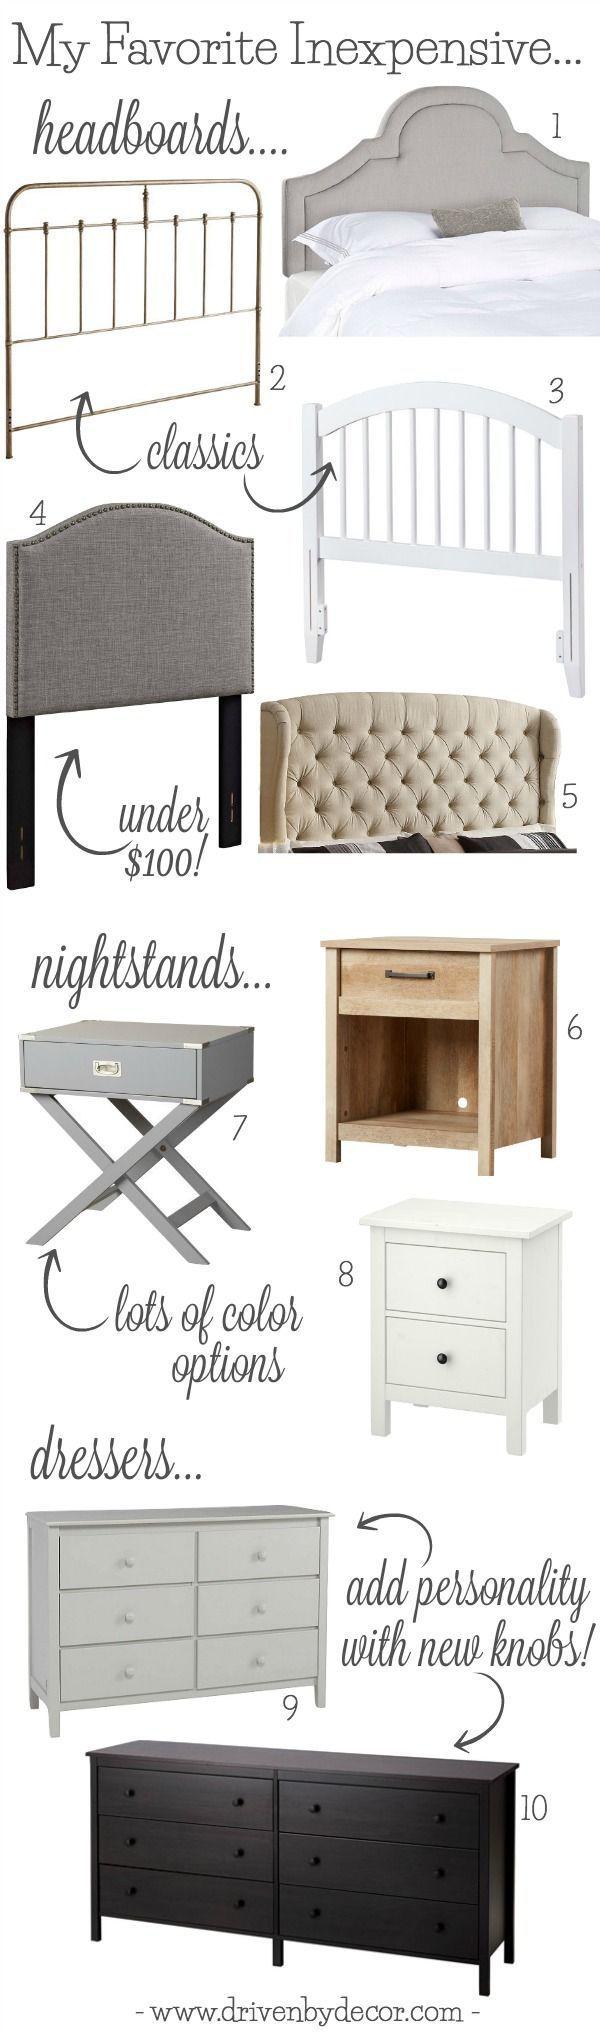 furniture pieces for bedrooms. My Favorite Inexpensive Bedroom Furniture Pieces - From Headboards To Nightstands Dressers! For Bedrooms